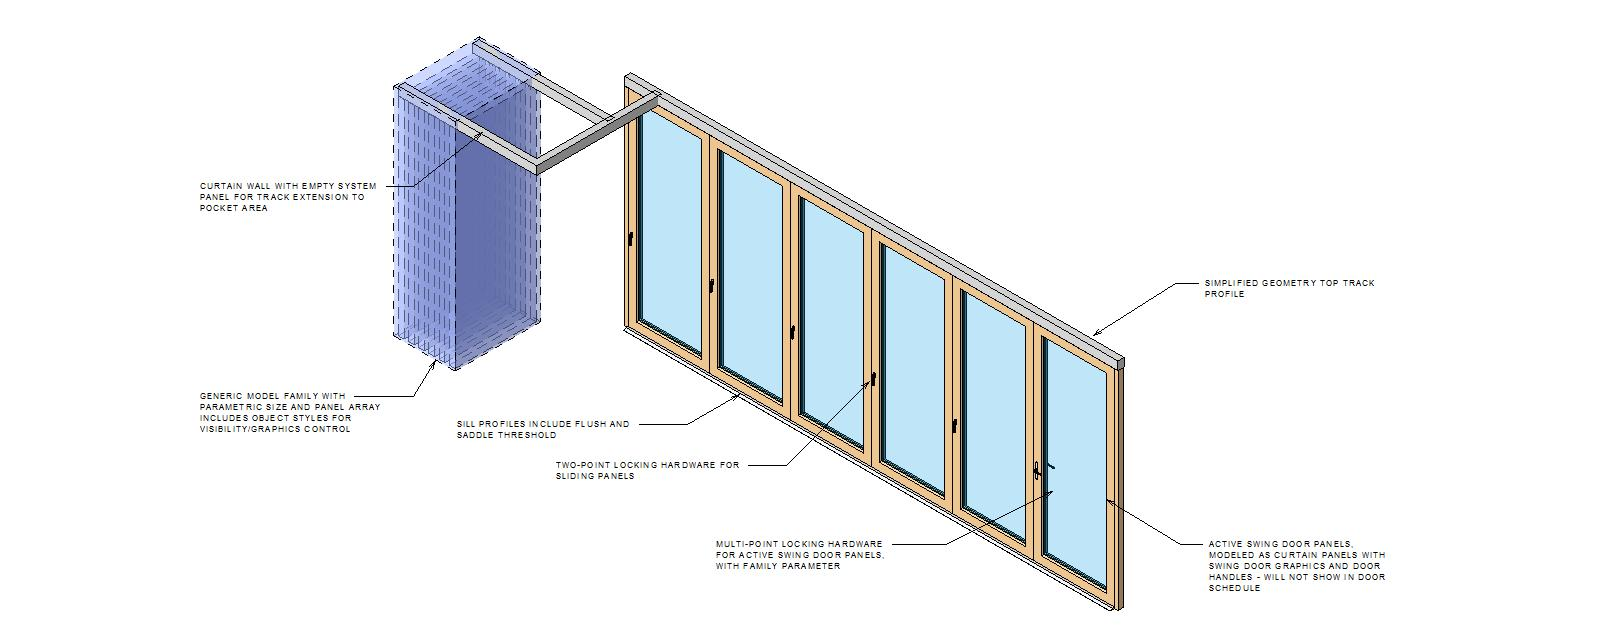 Glass folding door revit window family corner window revit sliding - Bifold Windows Bifold Doors Doors And Hardware Folding Doors Hsw65 Assembly Systems Revit